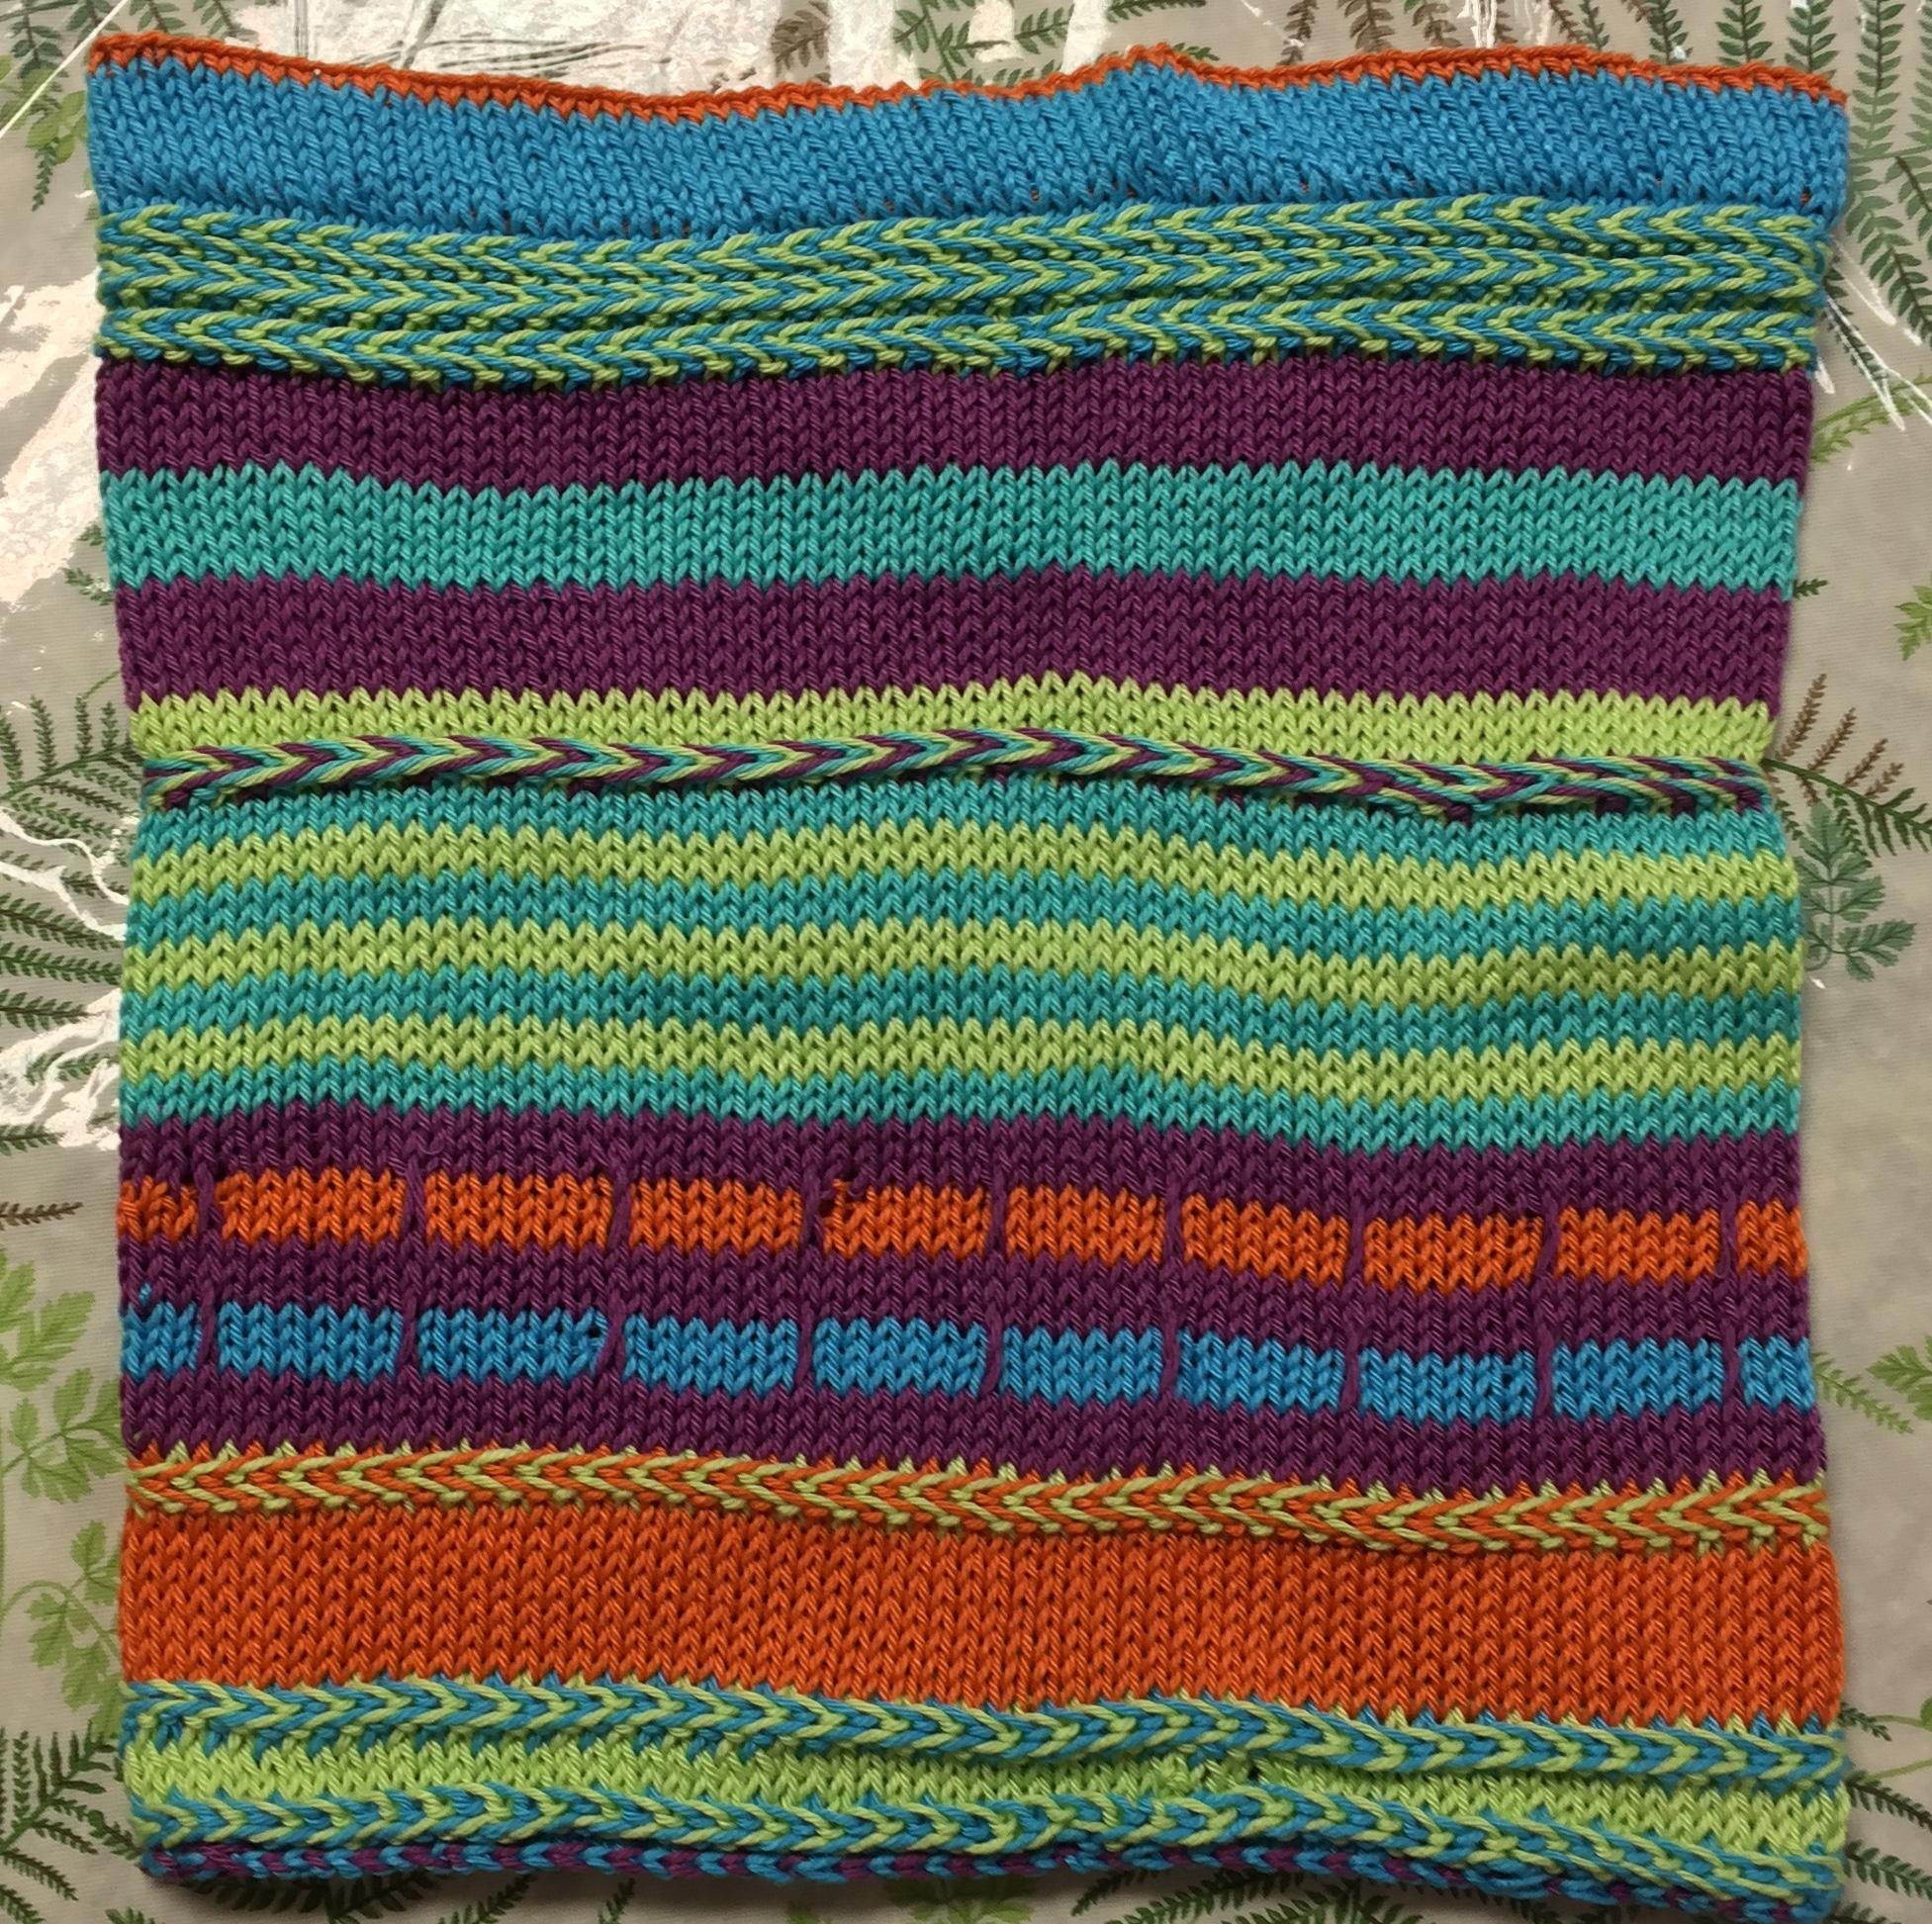 Yipes Stripe Cowl - Pima Yarn